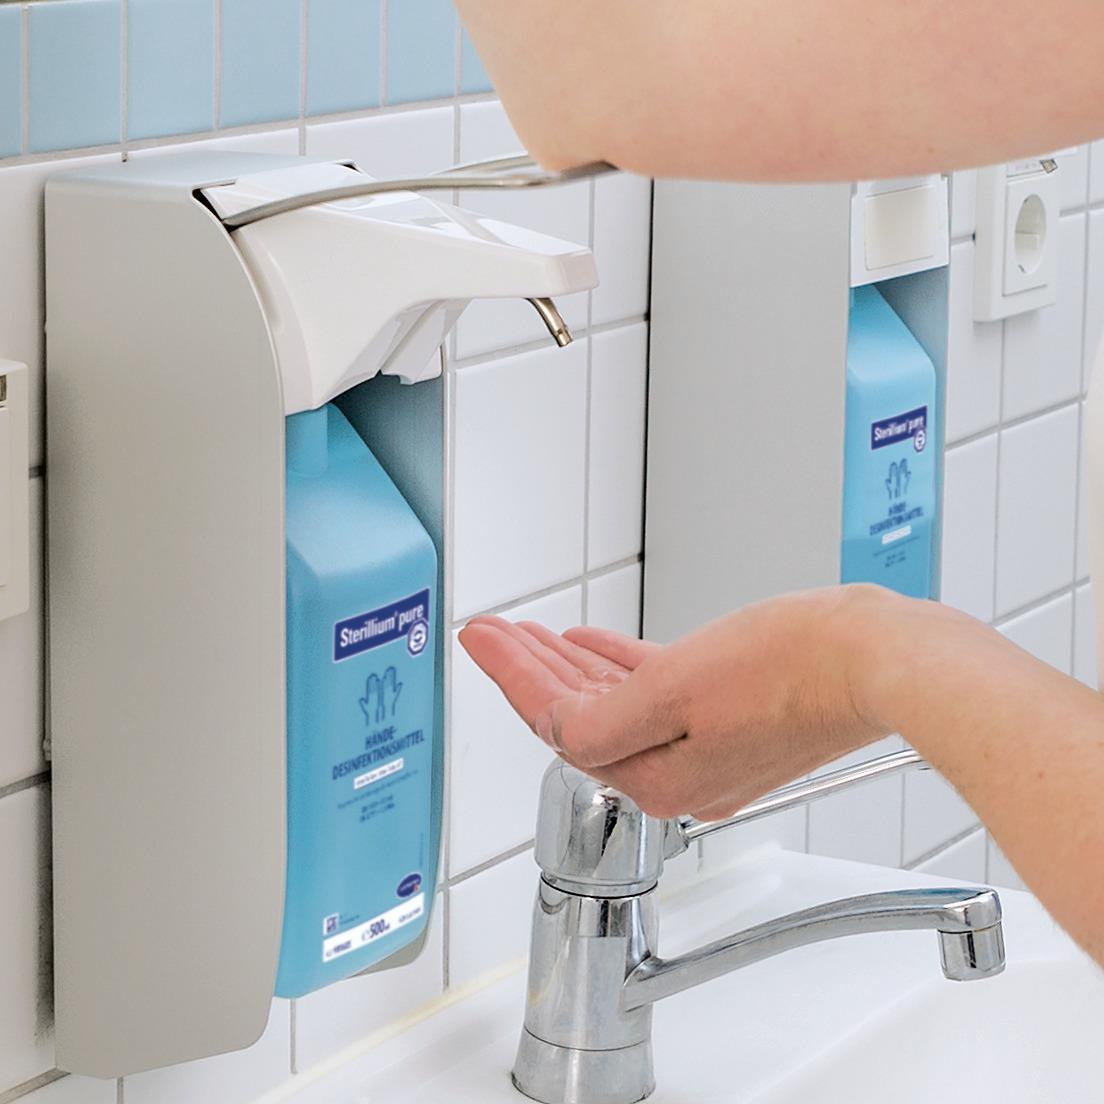 BODE Eurospender 1 plus | Spender mit kurzem Armhebel | 1 Liter